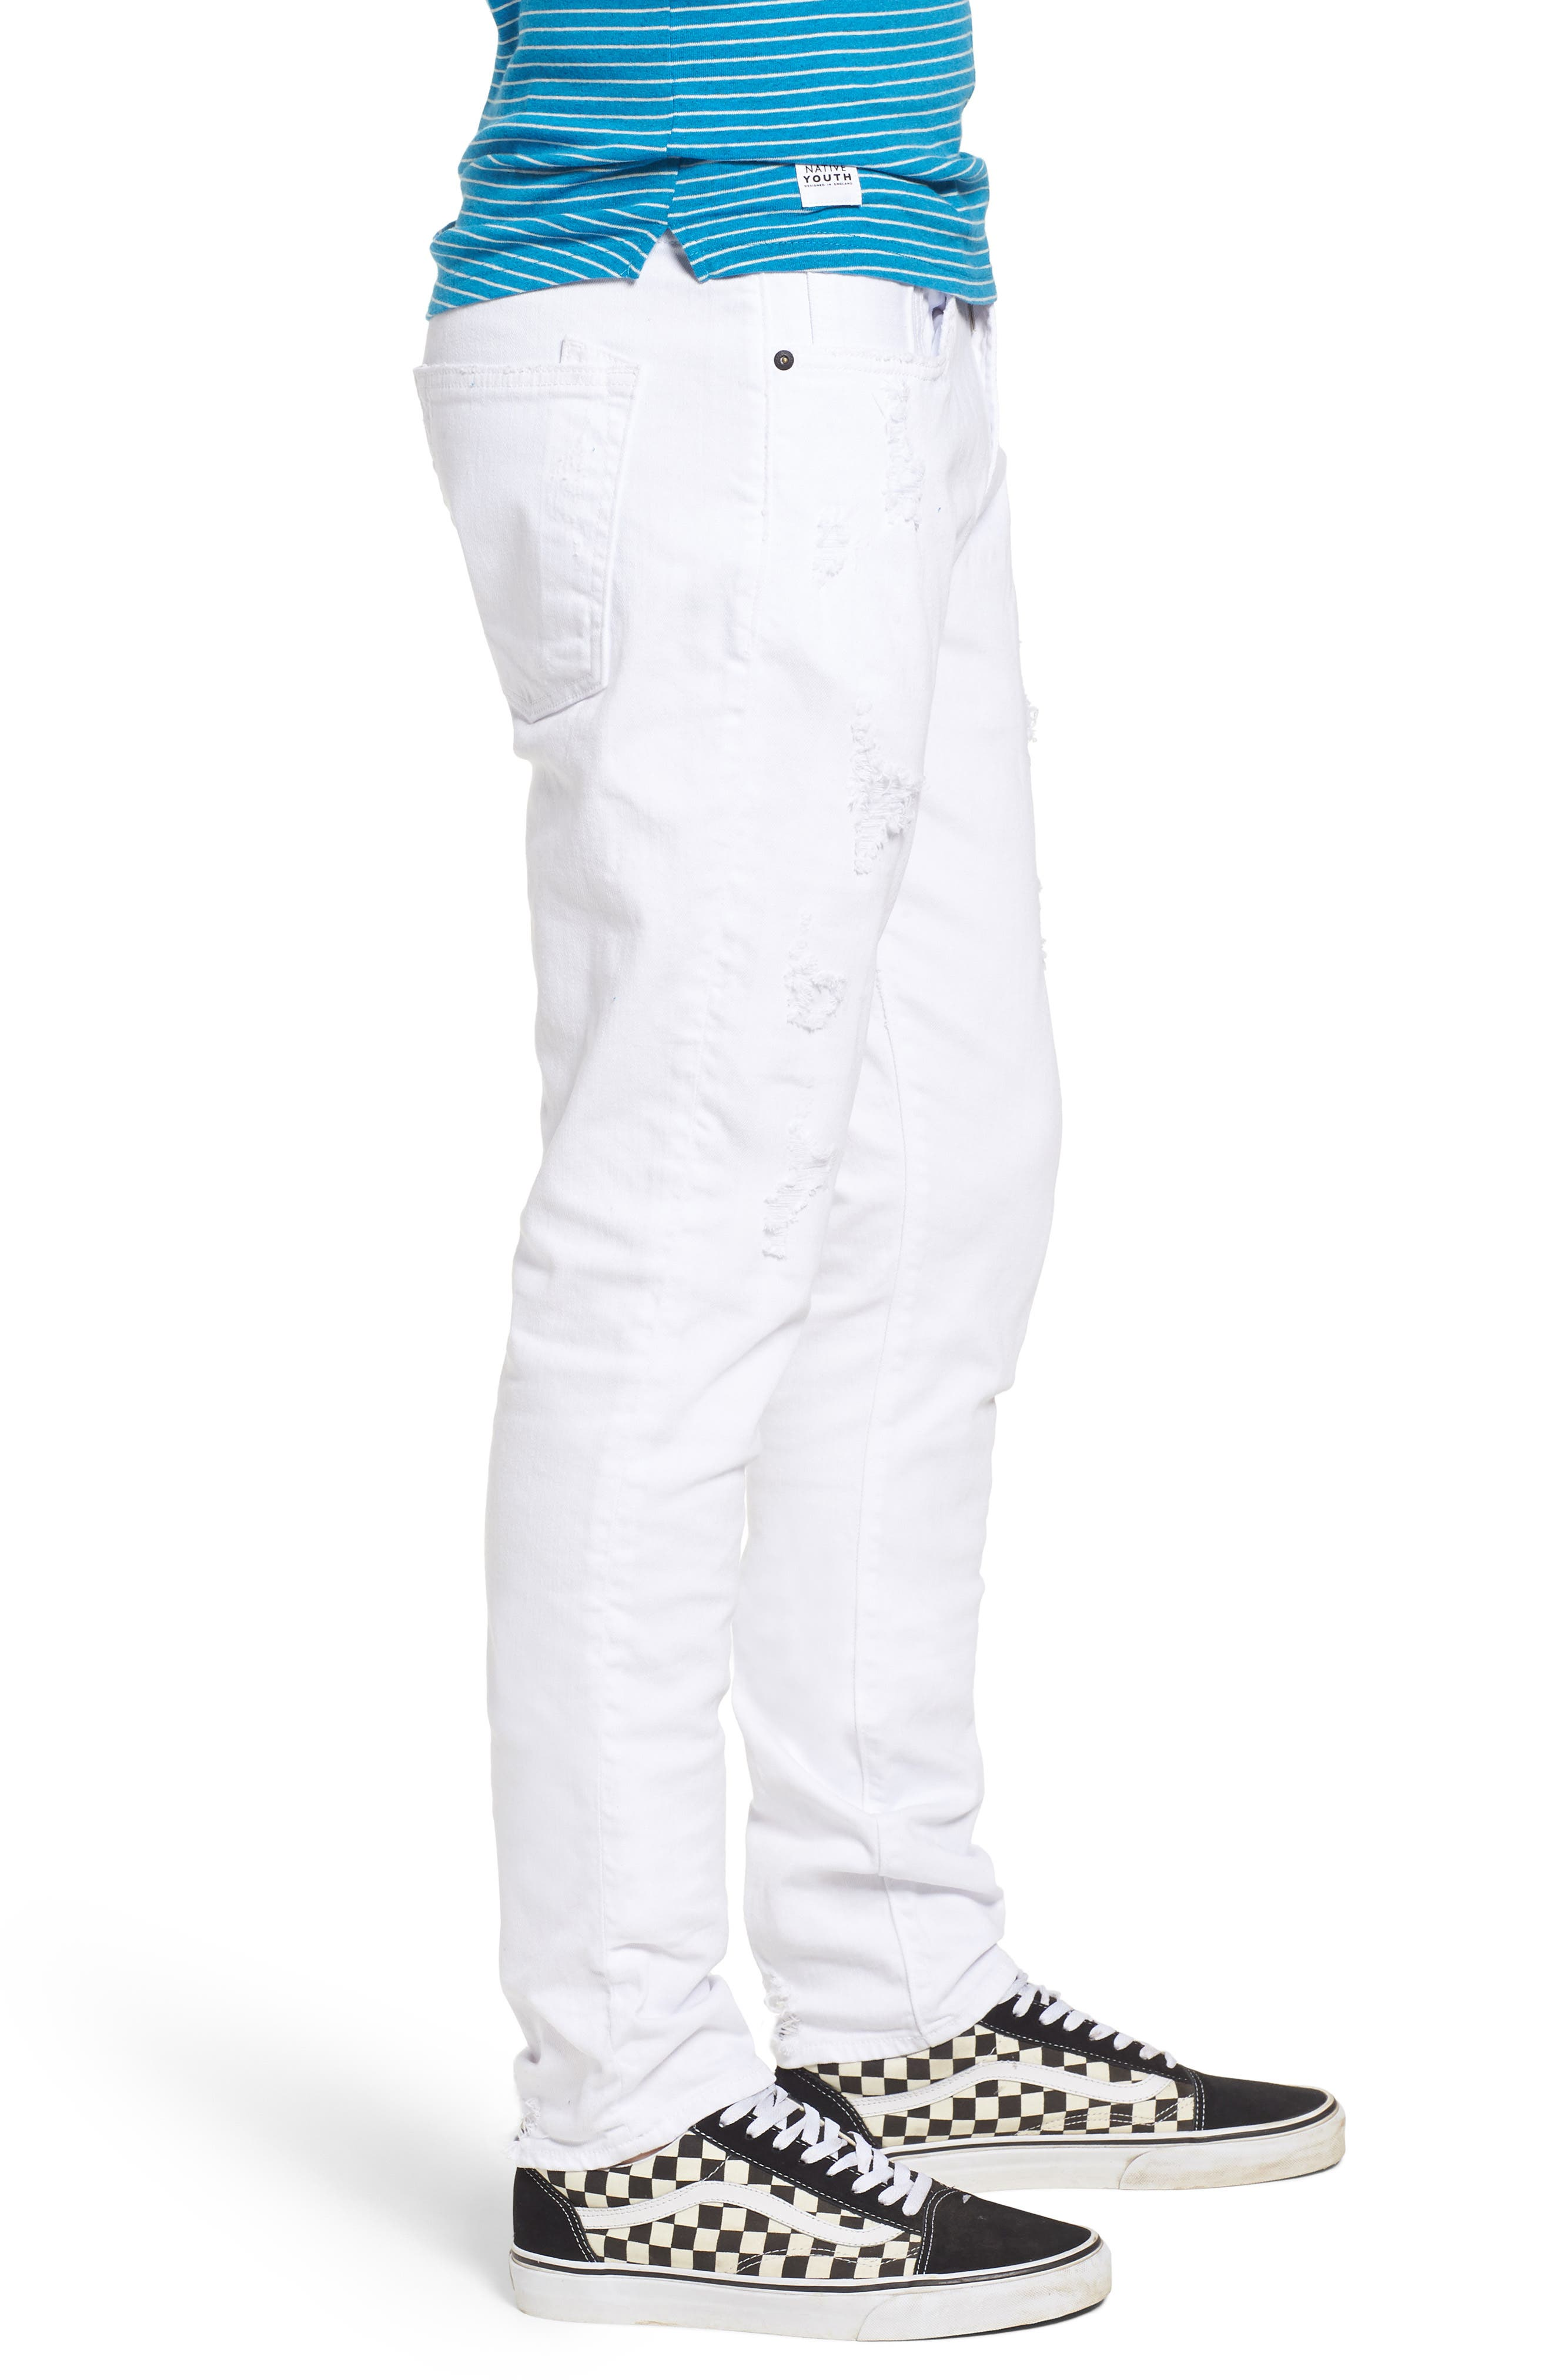 Windsor Slim Fit Jeans,                             Alternate thumbnail 3, color,                             Living White